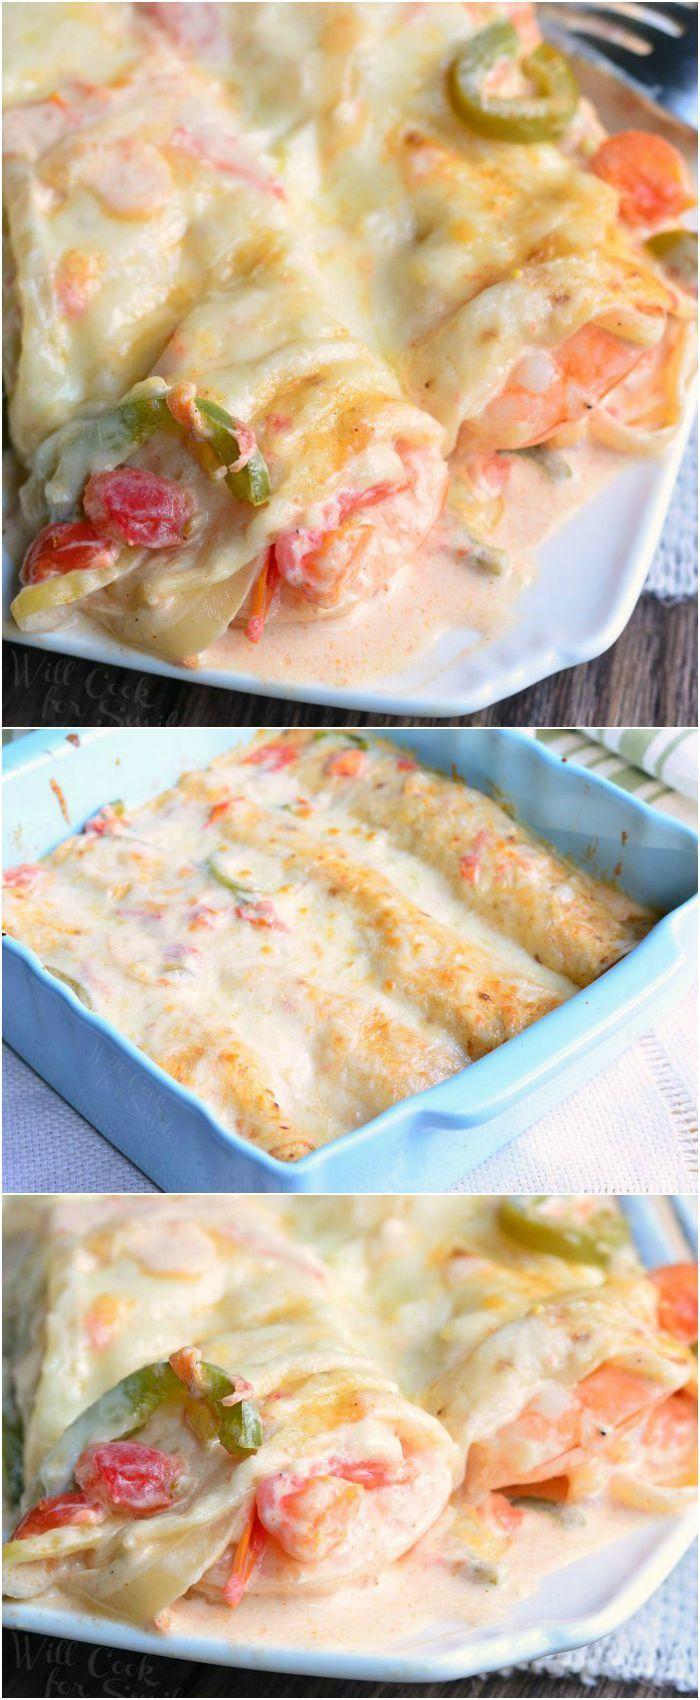 Spicy Creamy Shrimp Enchiladas   from http://willcookforsmiles.com #dinner #enchilada #seafood